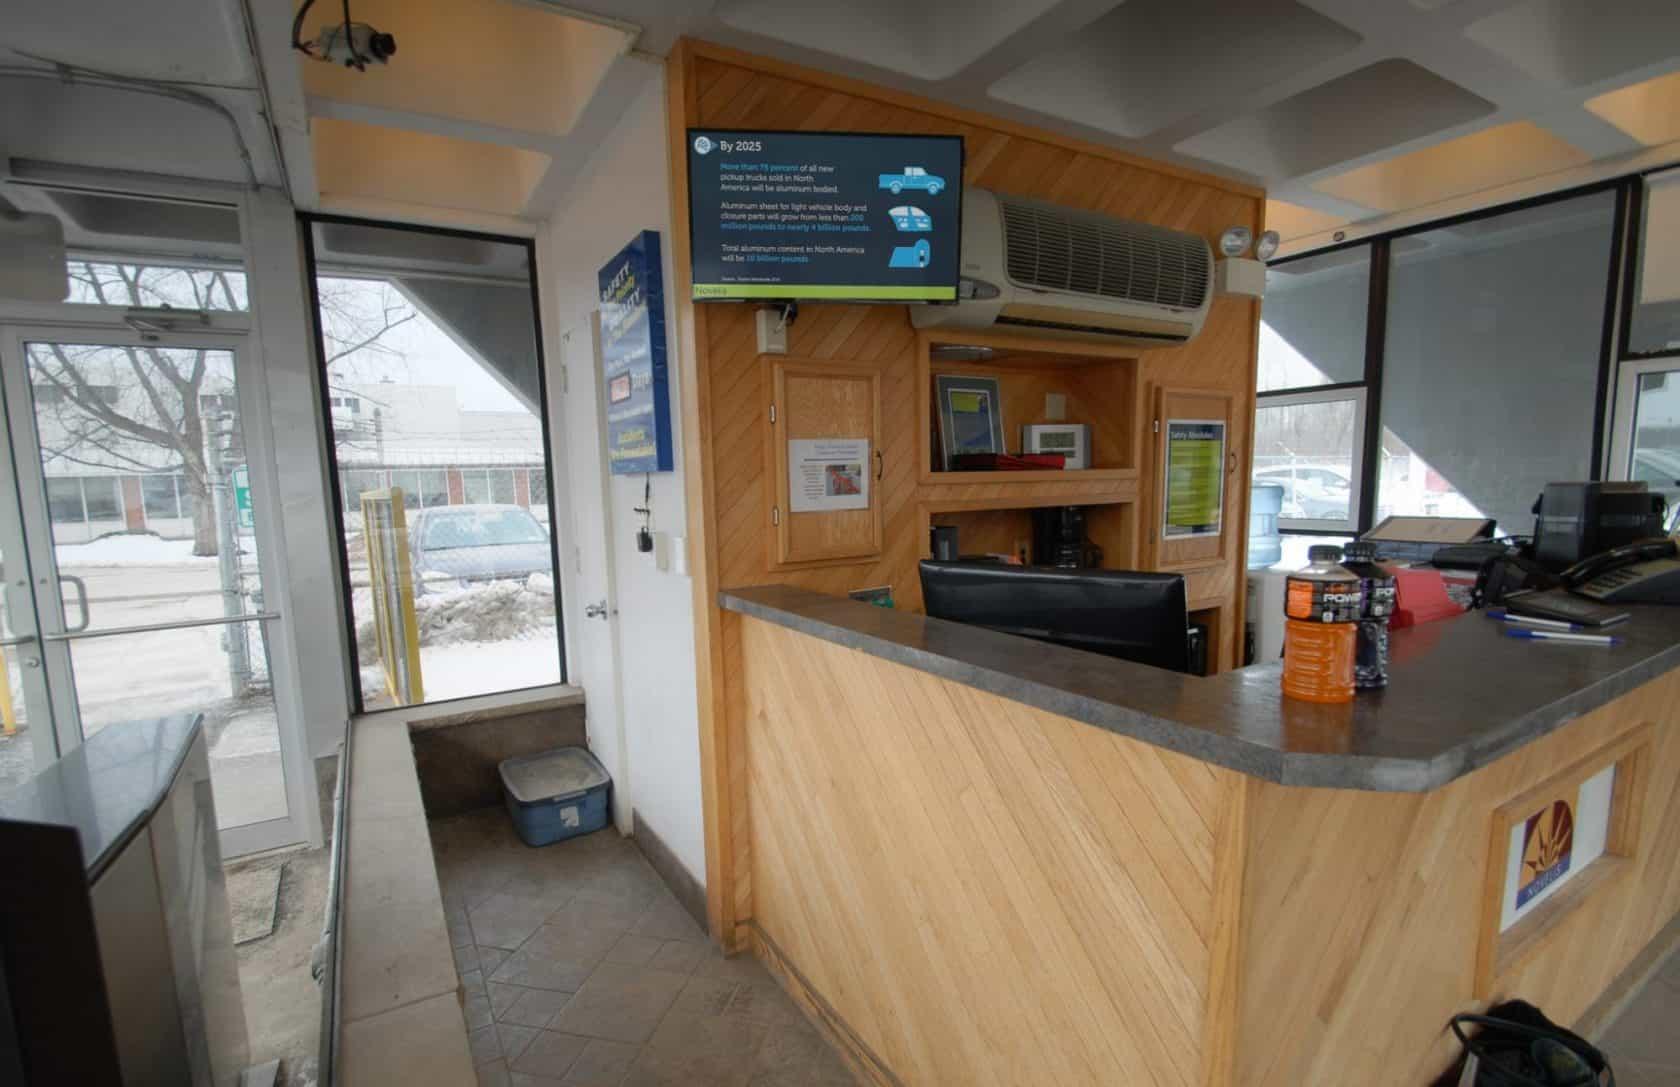 Manufacturing facility employee entrance guard shack.